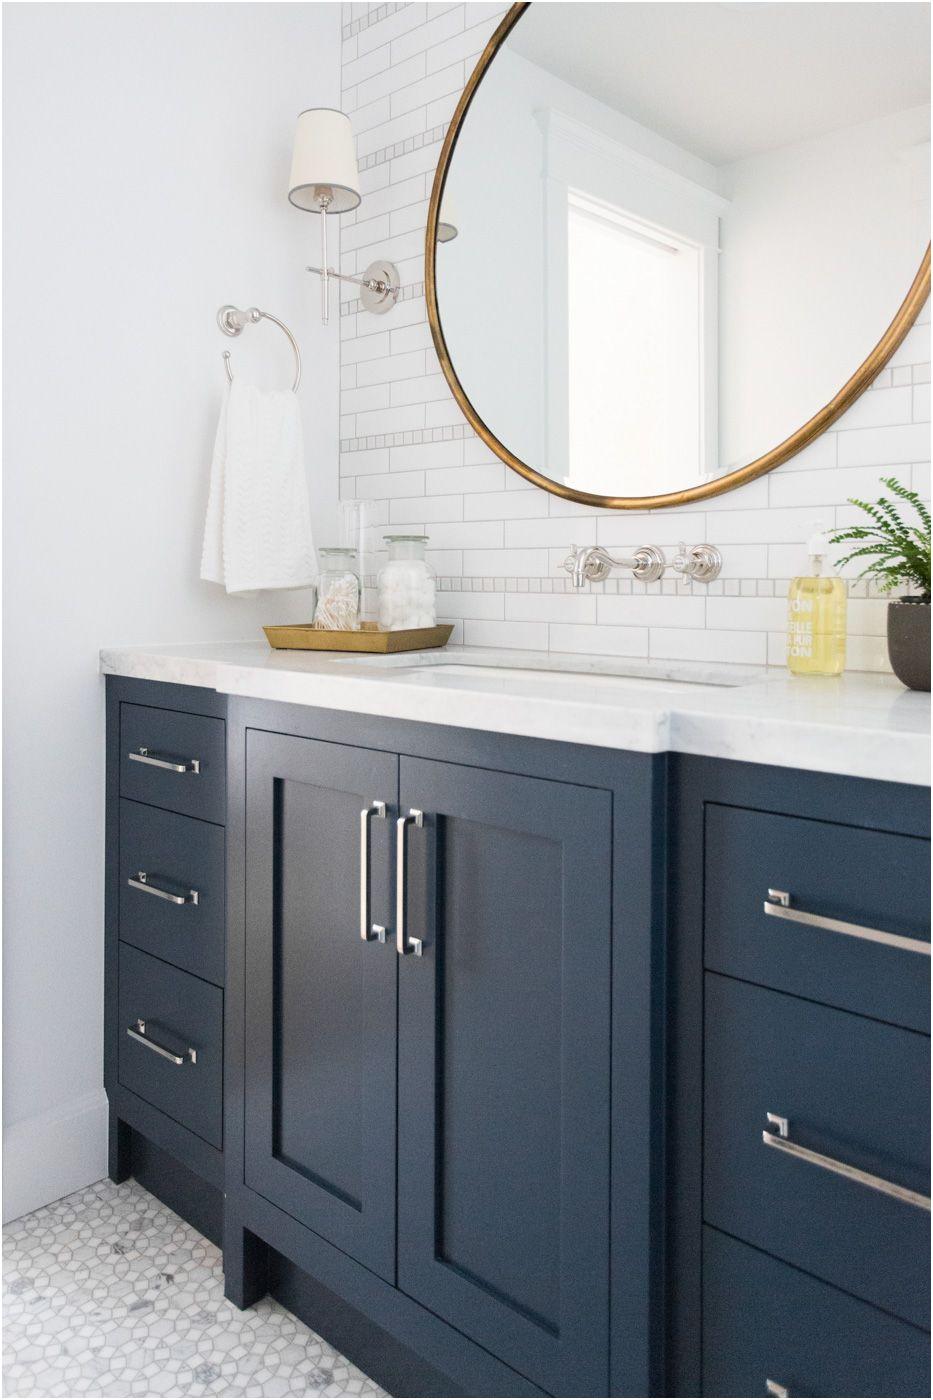 4 Door Mirrored Bathroom Cabinet Elegant Windsong tour Basement Pt 1 Studio Mcgee Portfolio